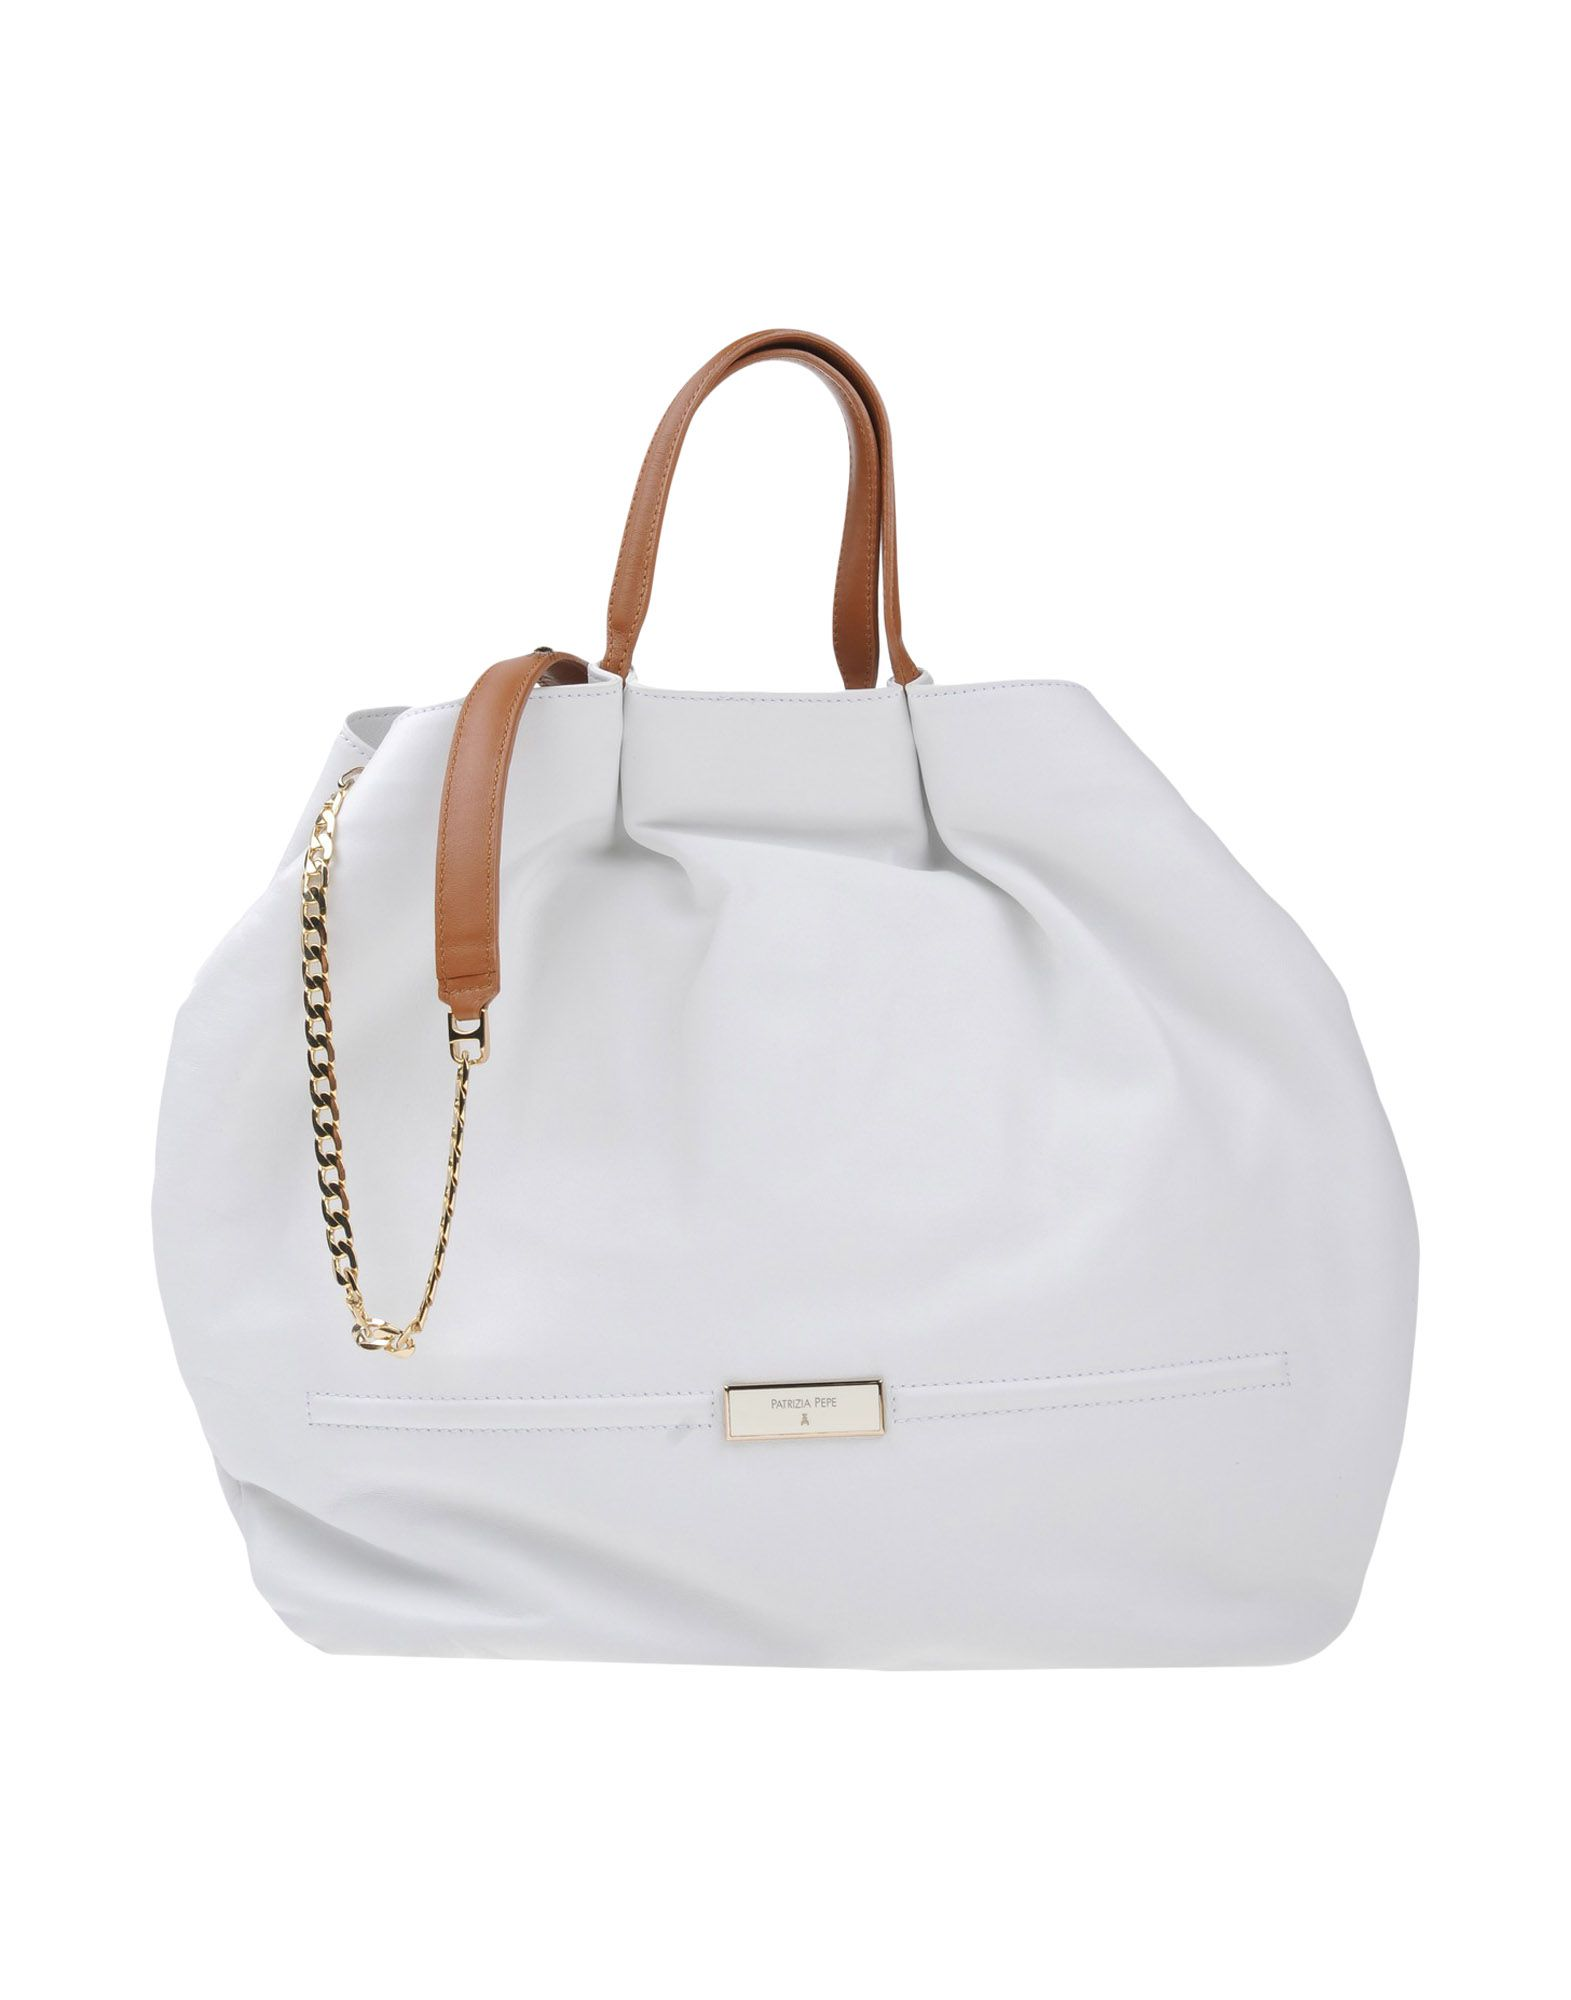 24ad94d1c5b0 Patrizia Pepe Handbags In White